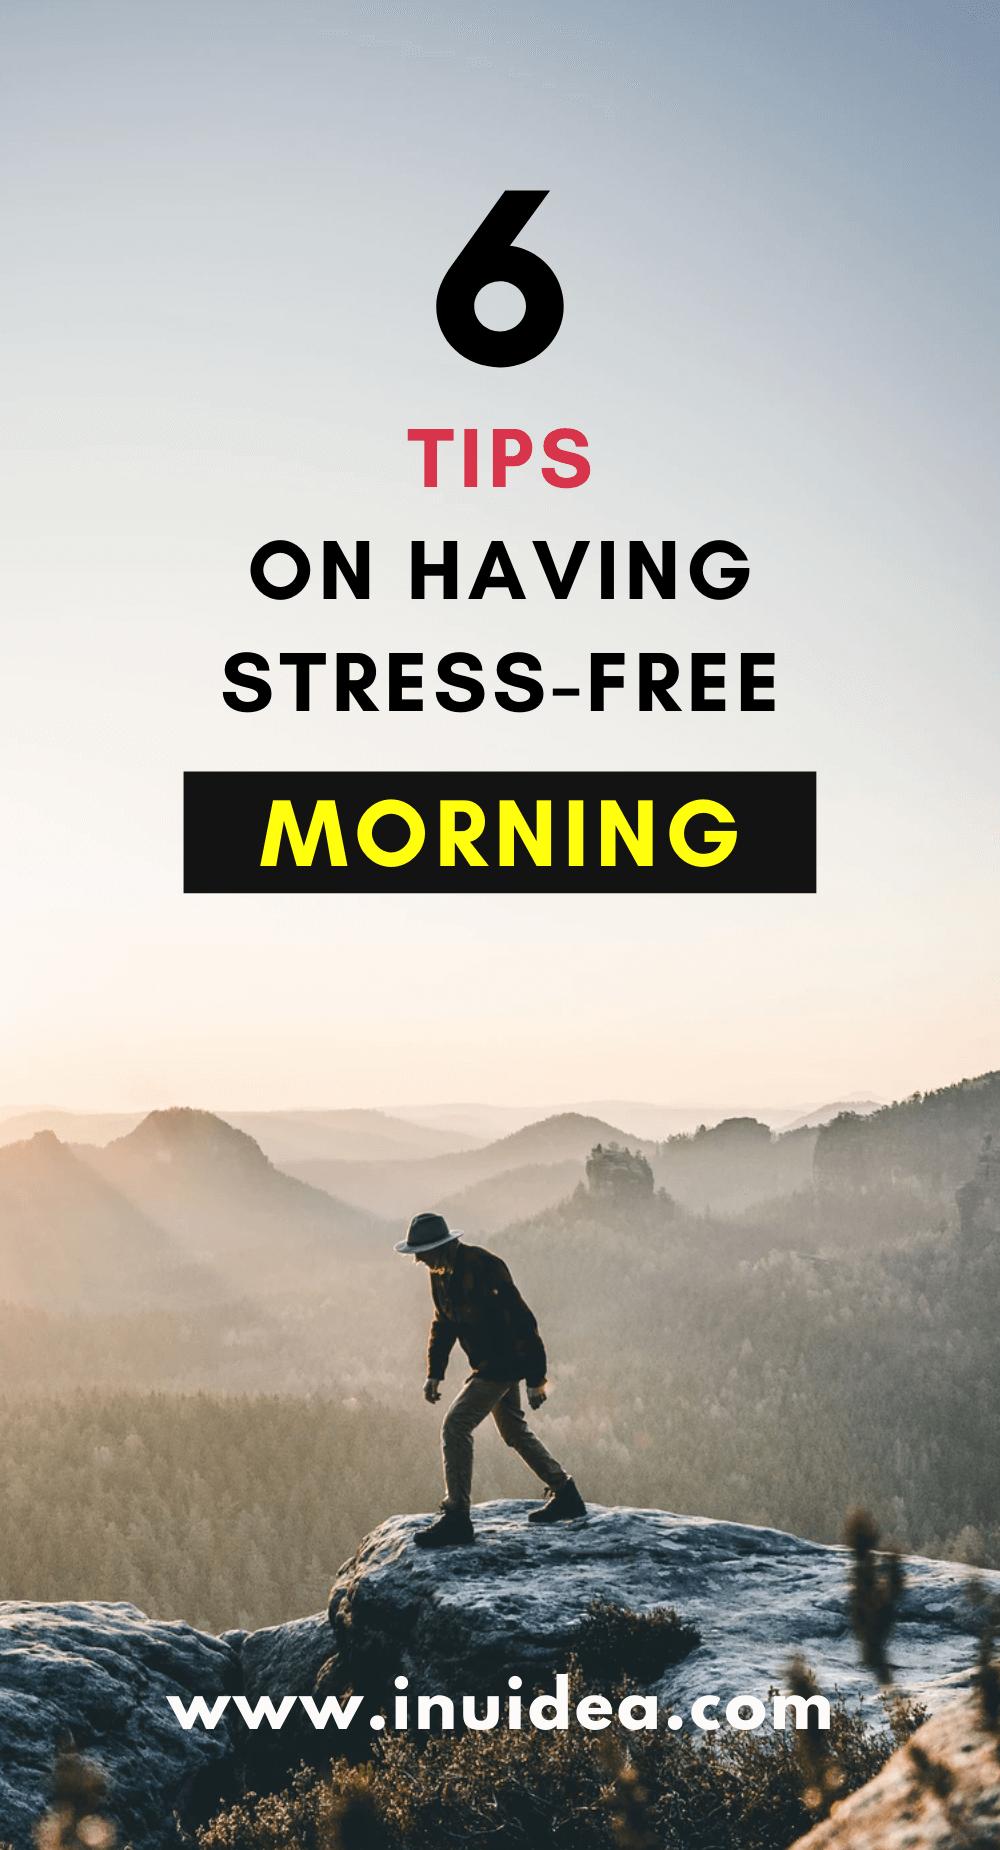 6 Tips on Having Stress-Free and Joyful Morning